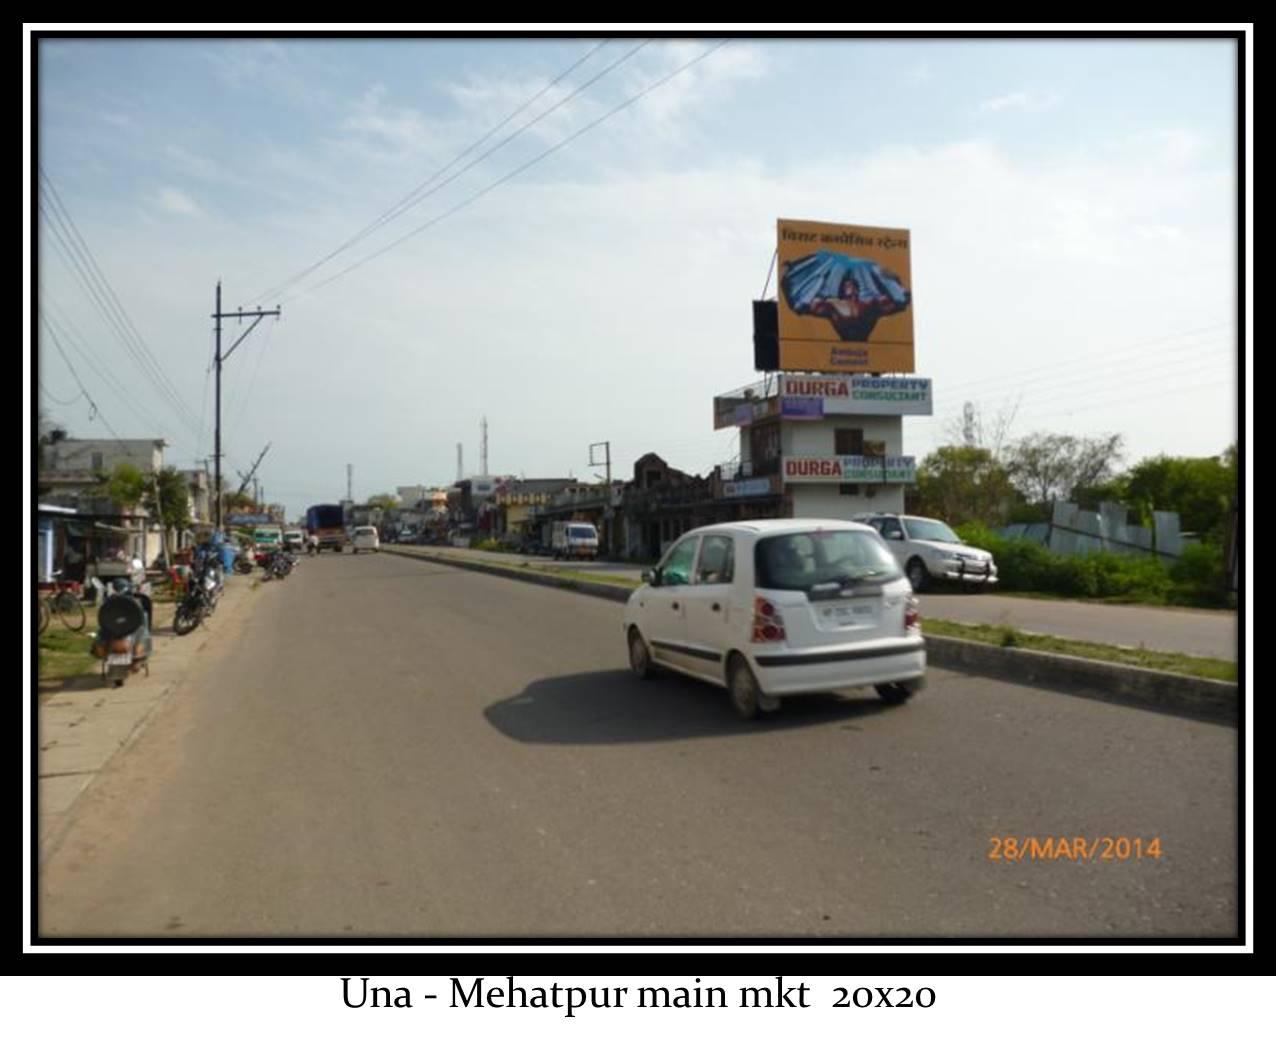 Mehatpur Main Market, Una